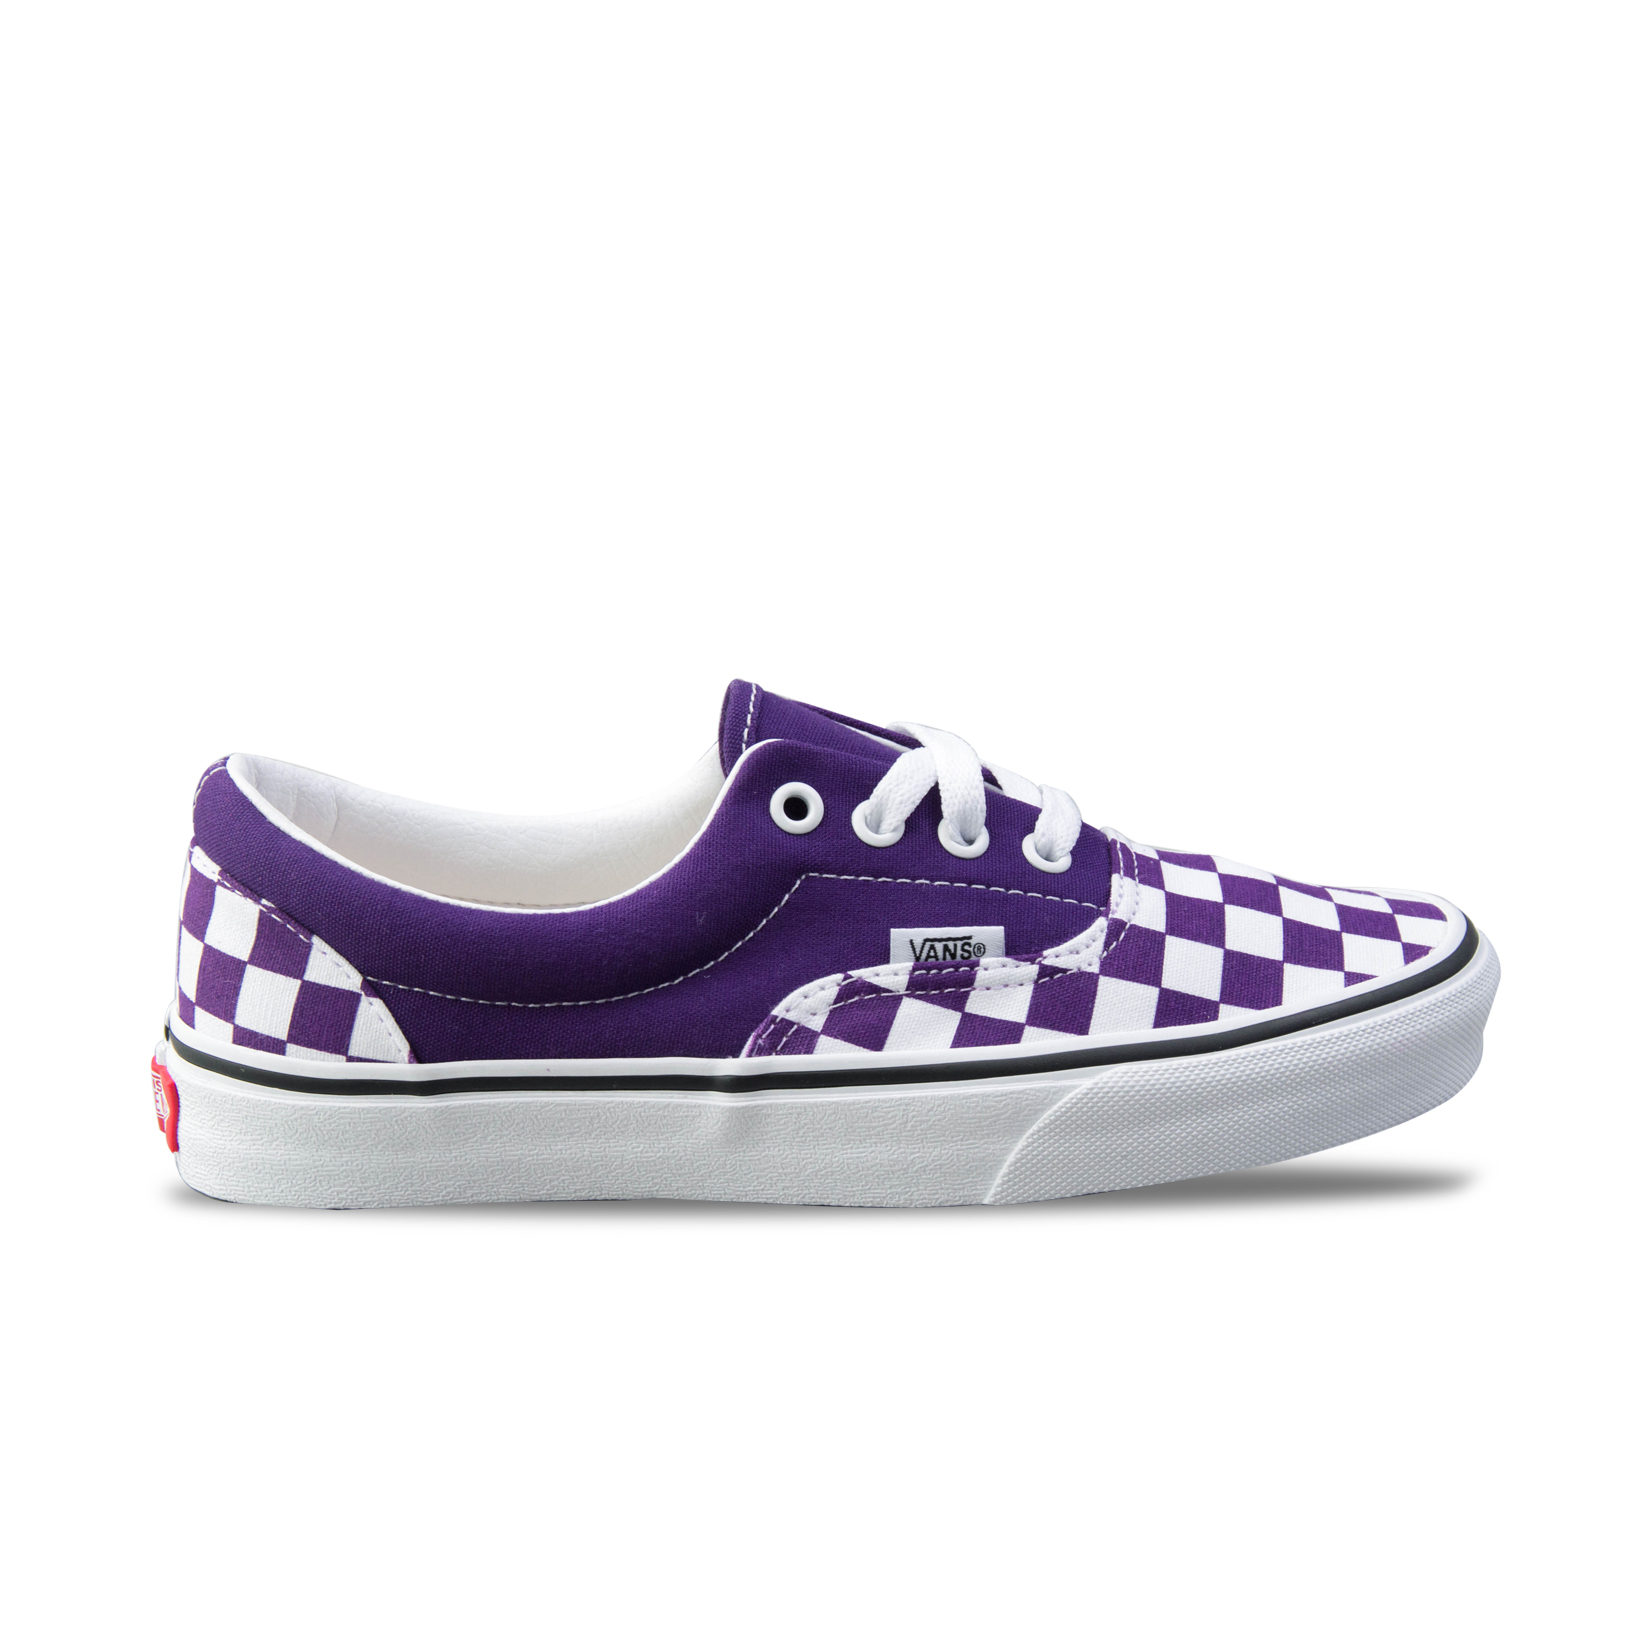 Vans Era Checkerboard Purple